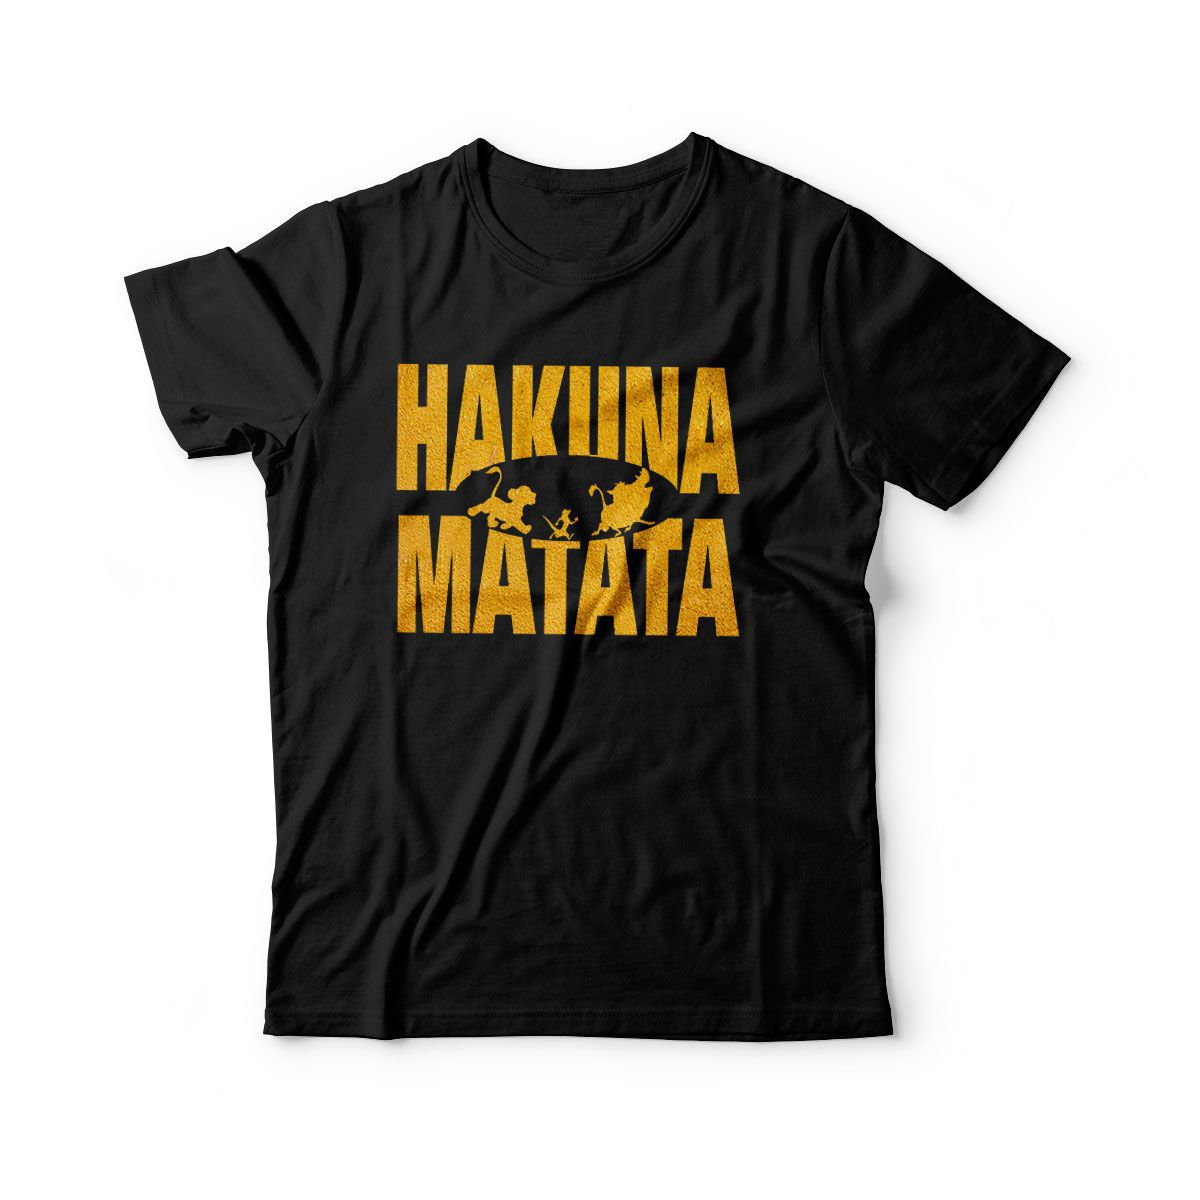 camiseta infantil filmes rei leao hakuna matata